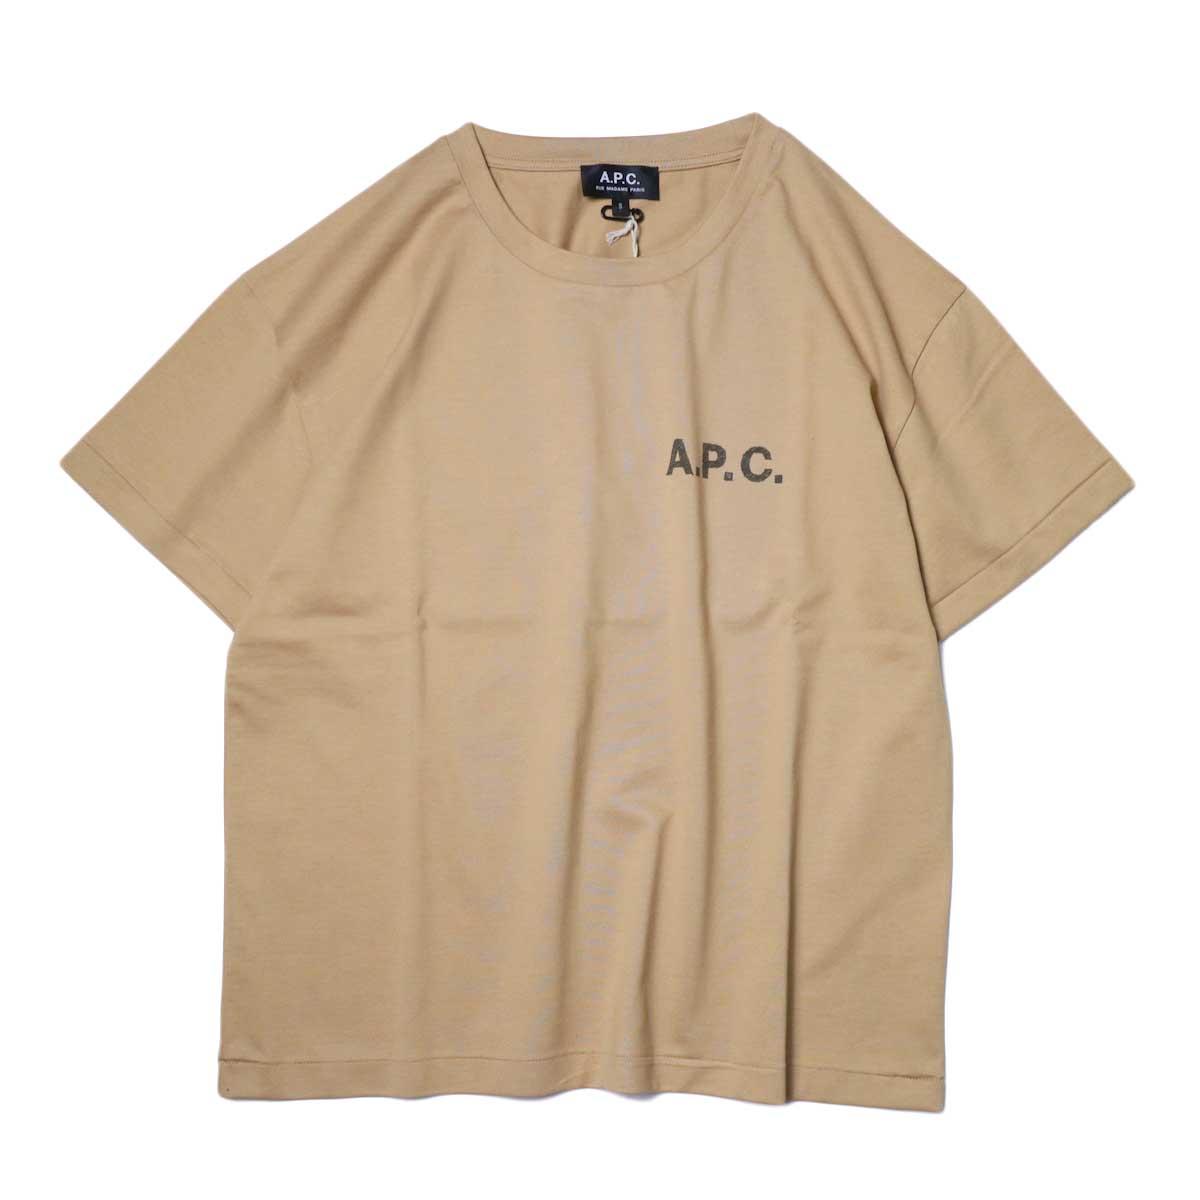 A.P.C. / Judy Tシャツ (Beige)